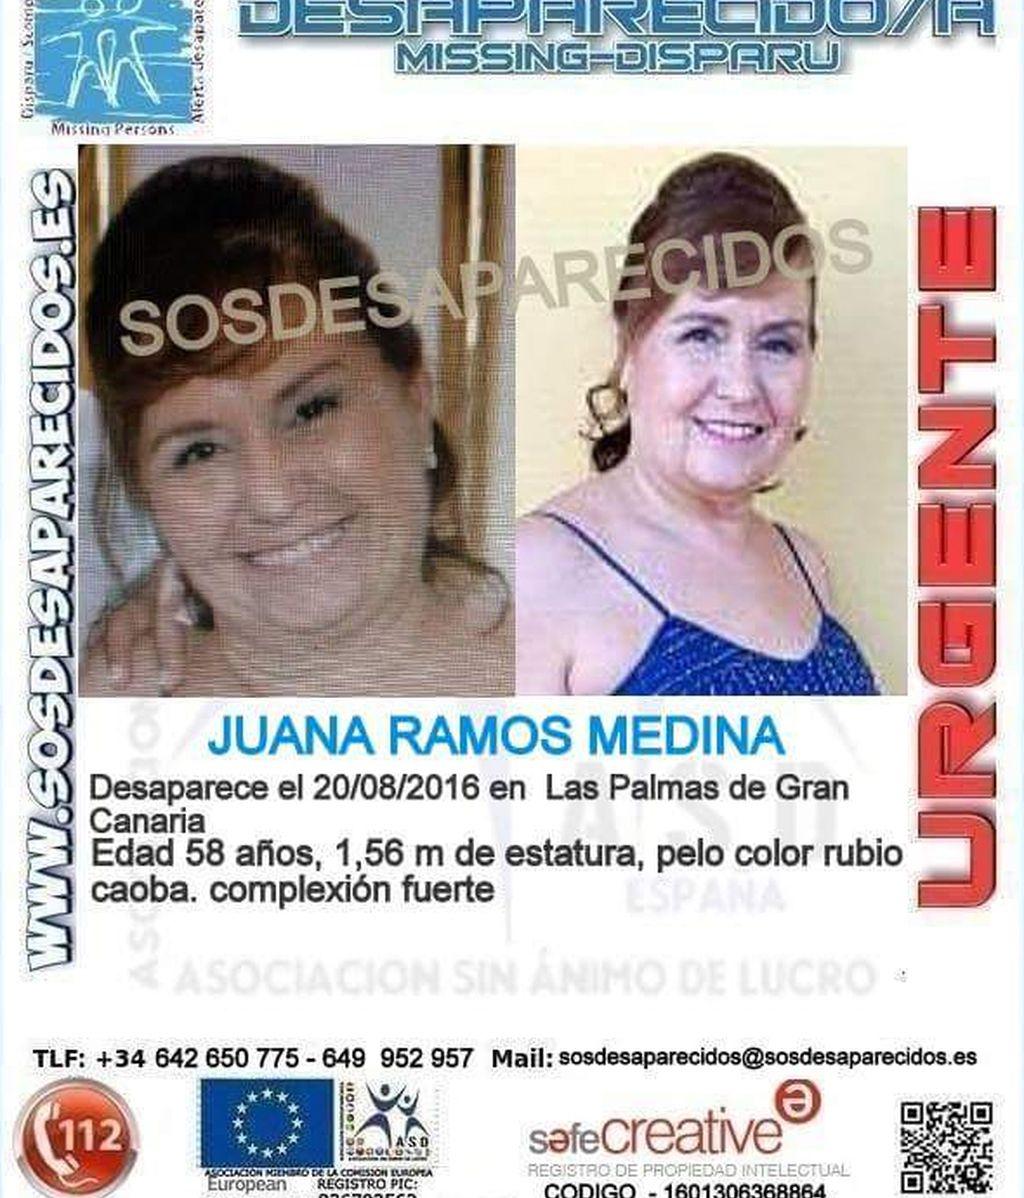 Desaparecida, Juana Ramos Medina